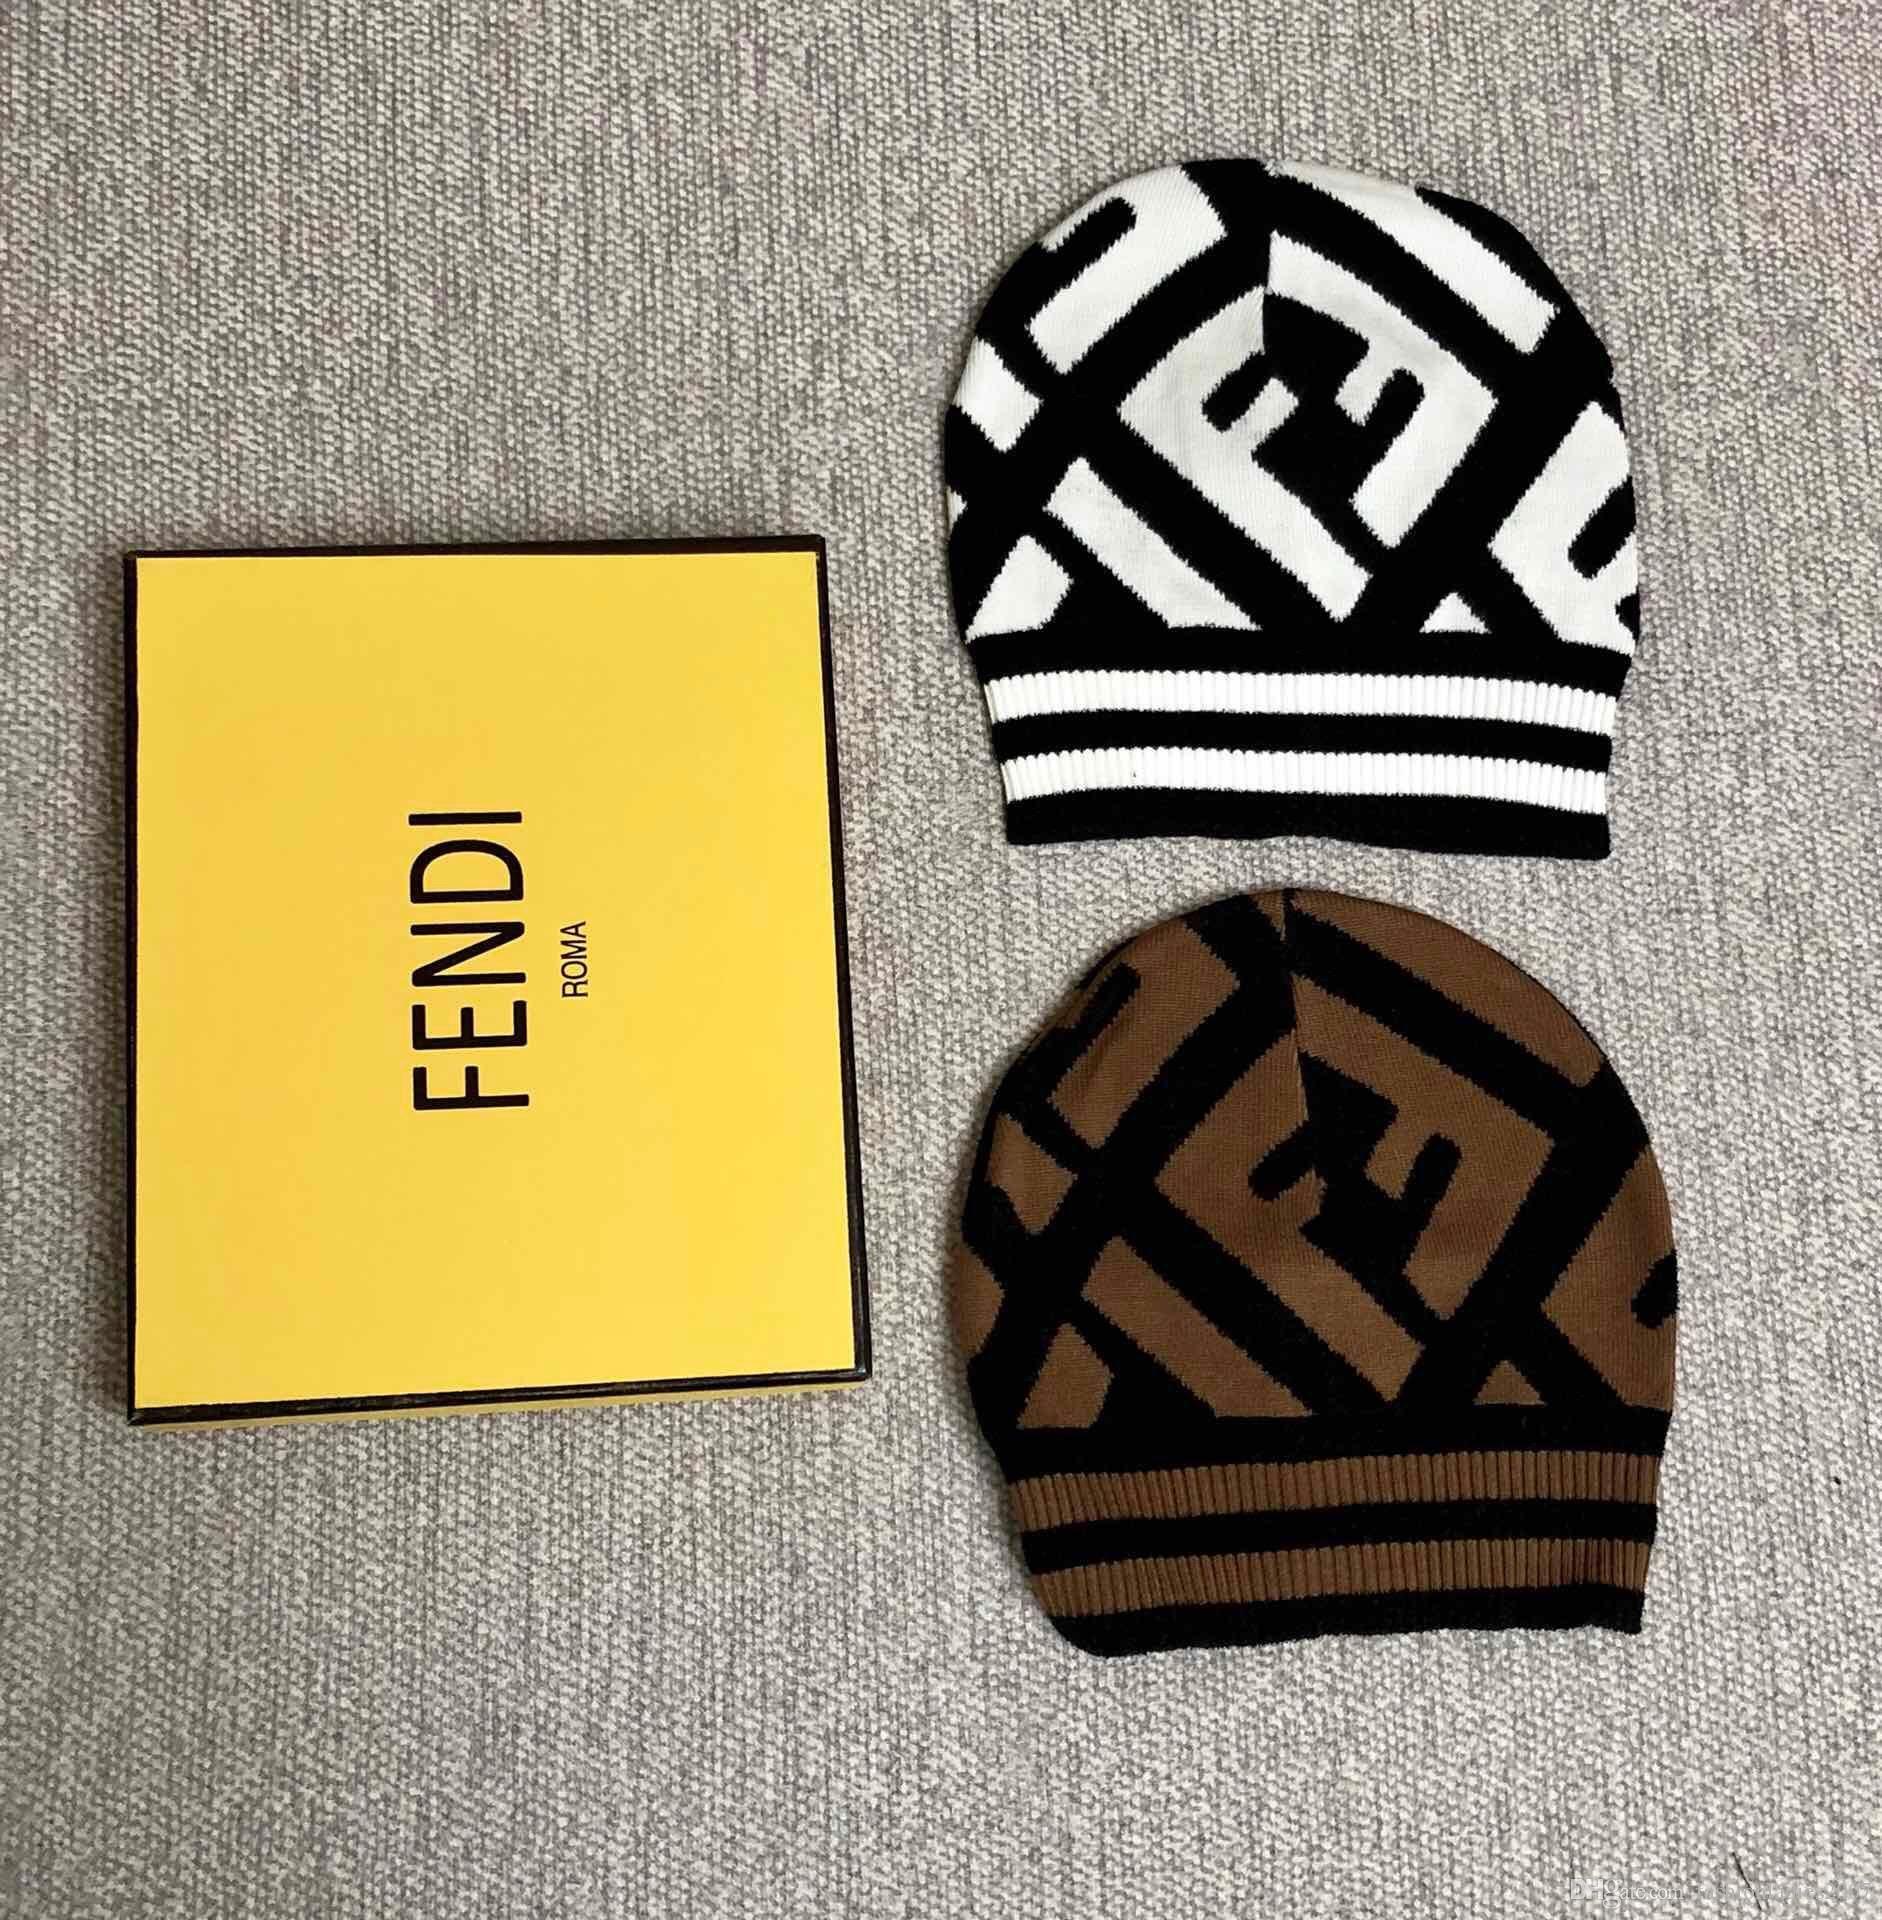 Designer Winter Wool Hats For Women And Men Luxury Brand Fashion ... 943e9f71564